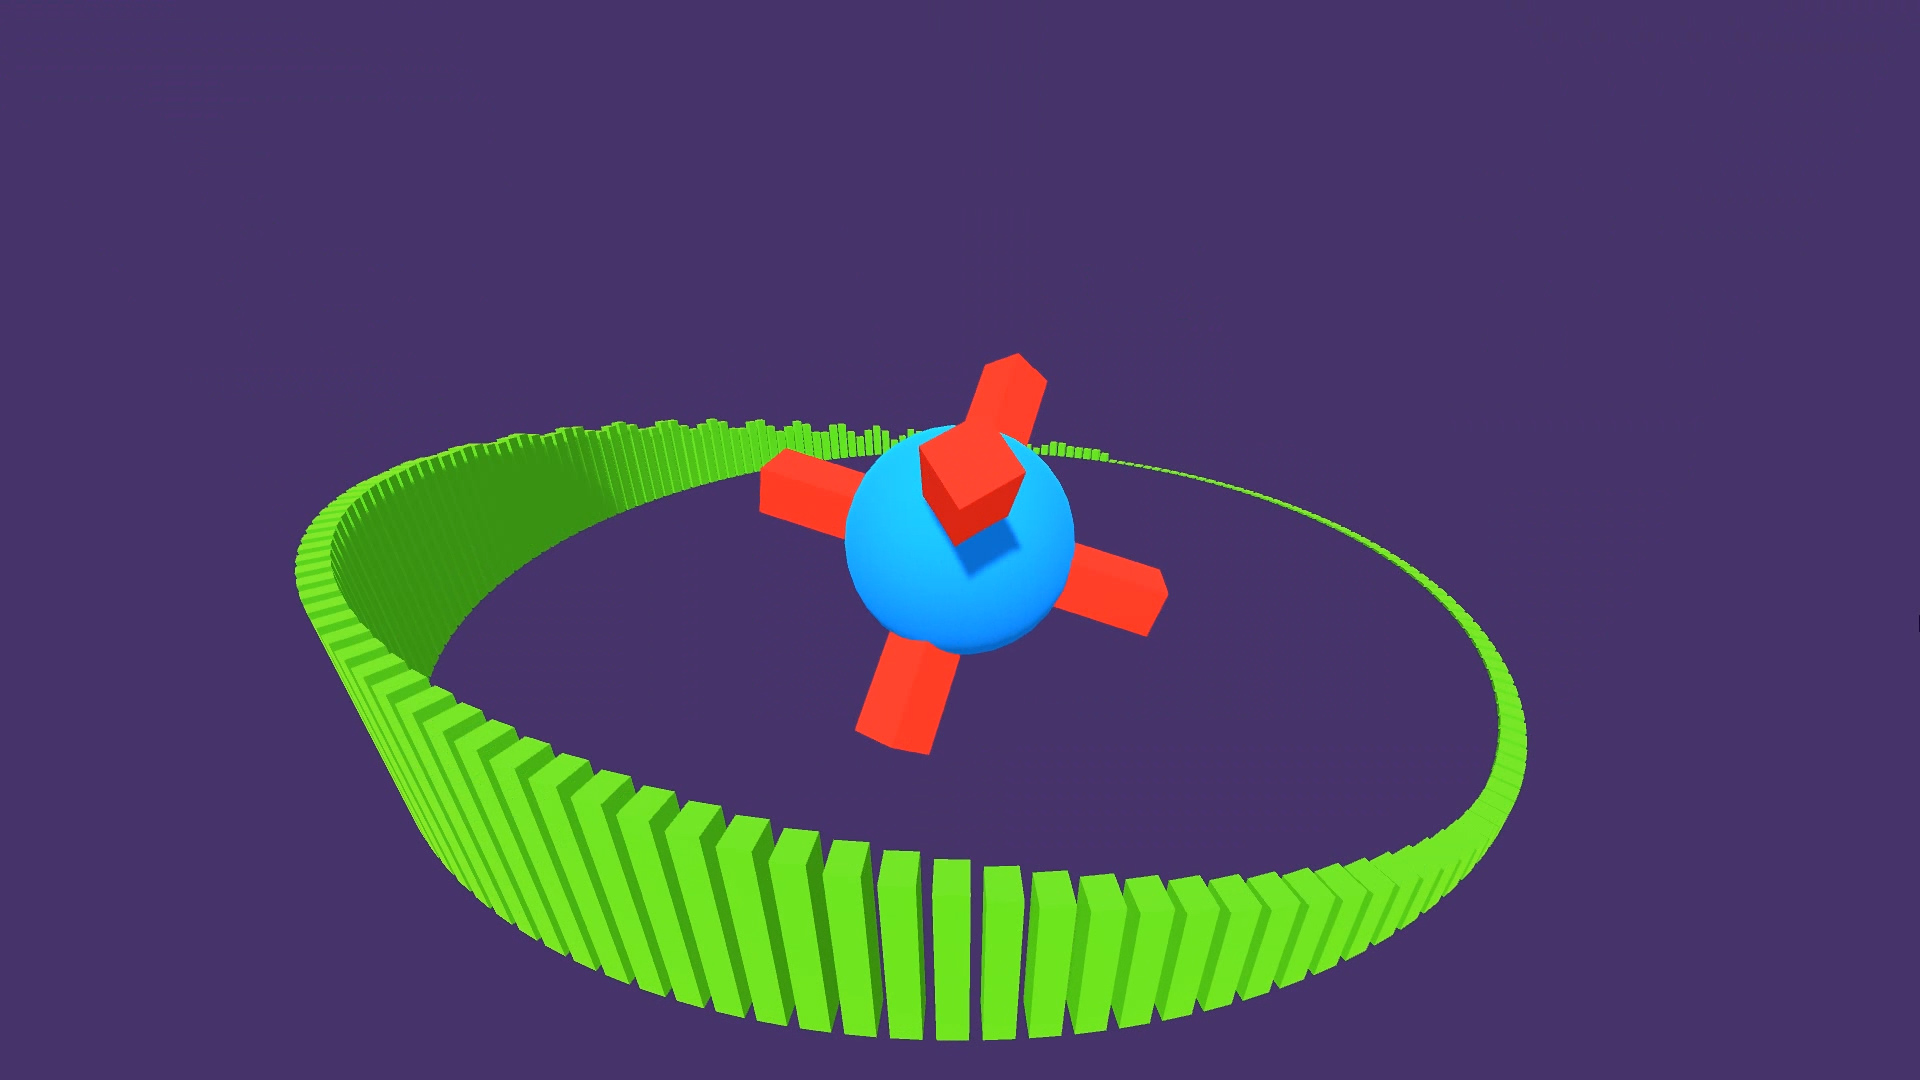 konsfik-procedural-audio-made-in-unity3d-autoplay-mode-screenshot-7